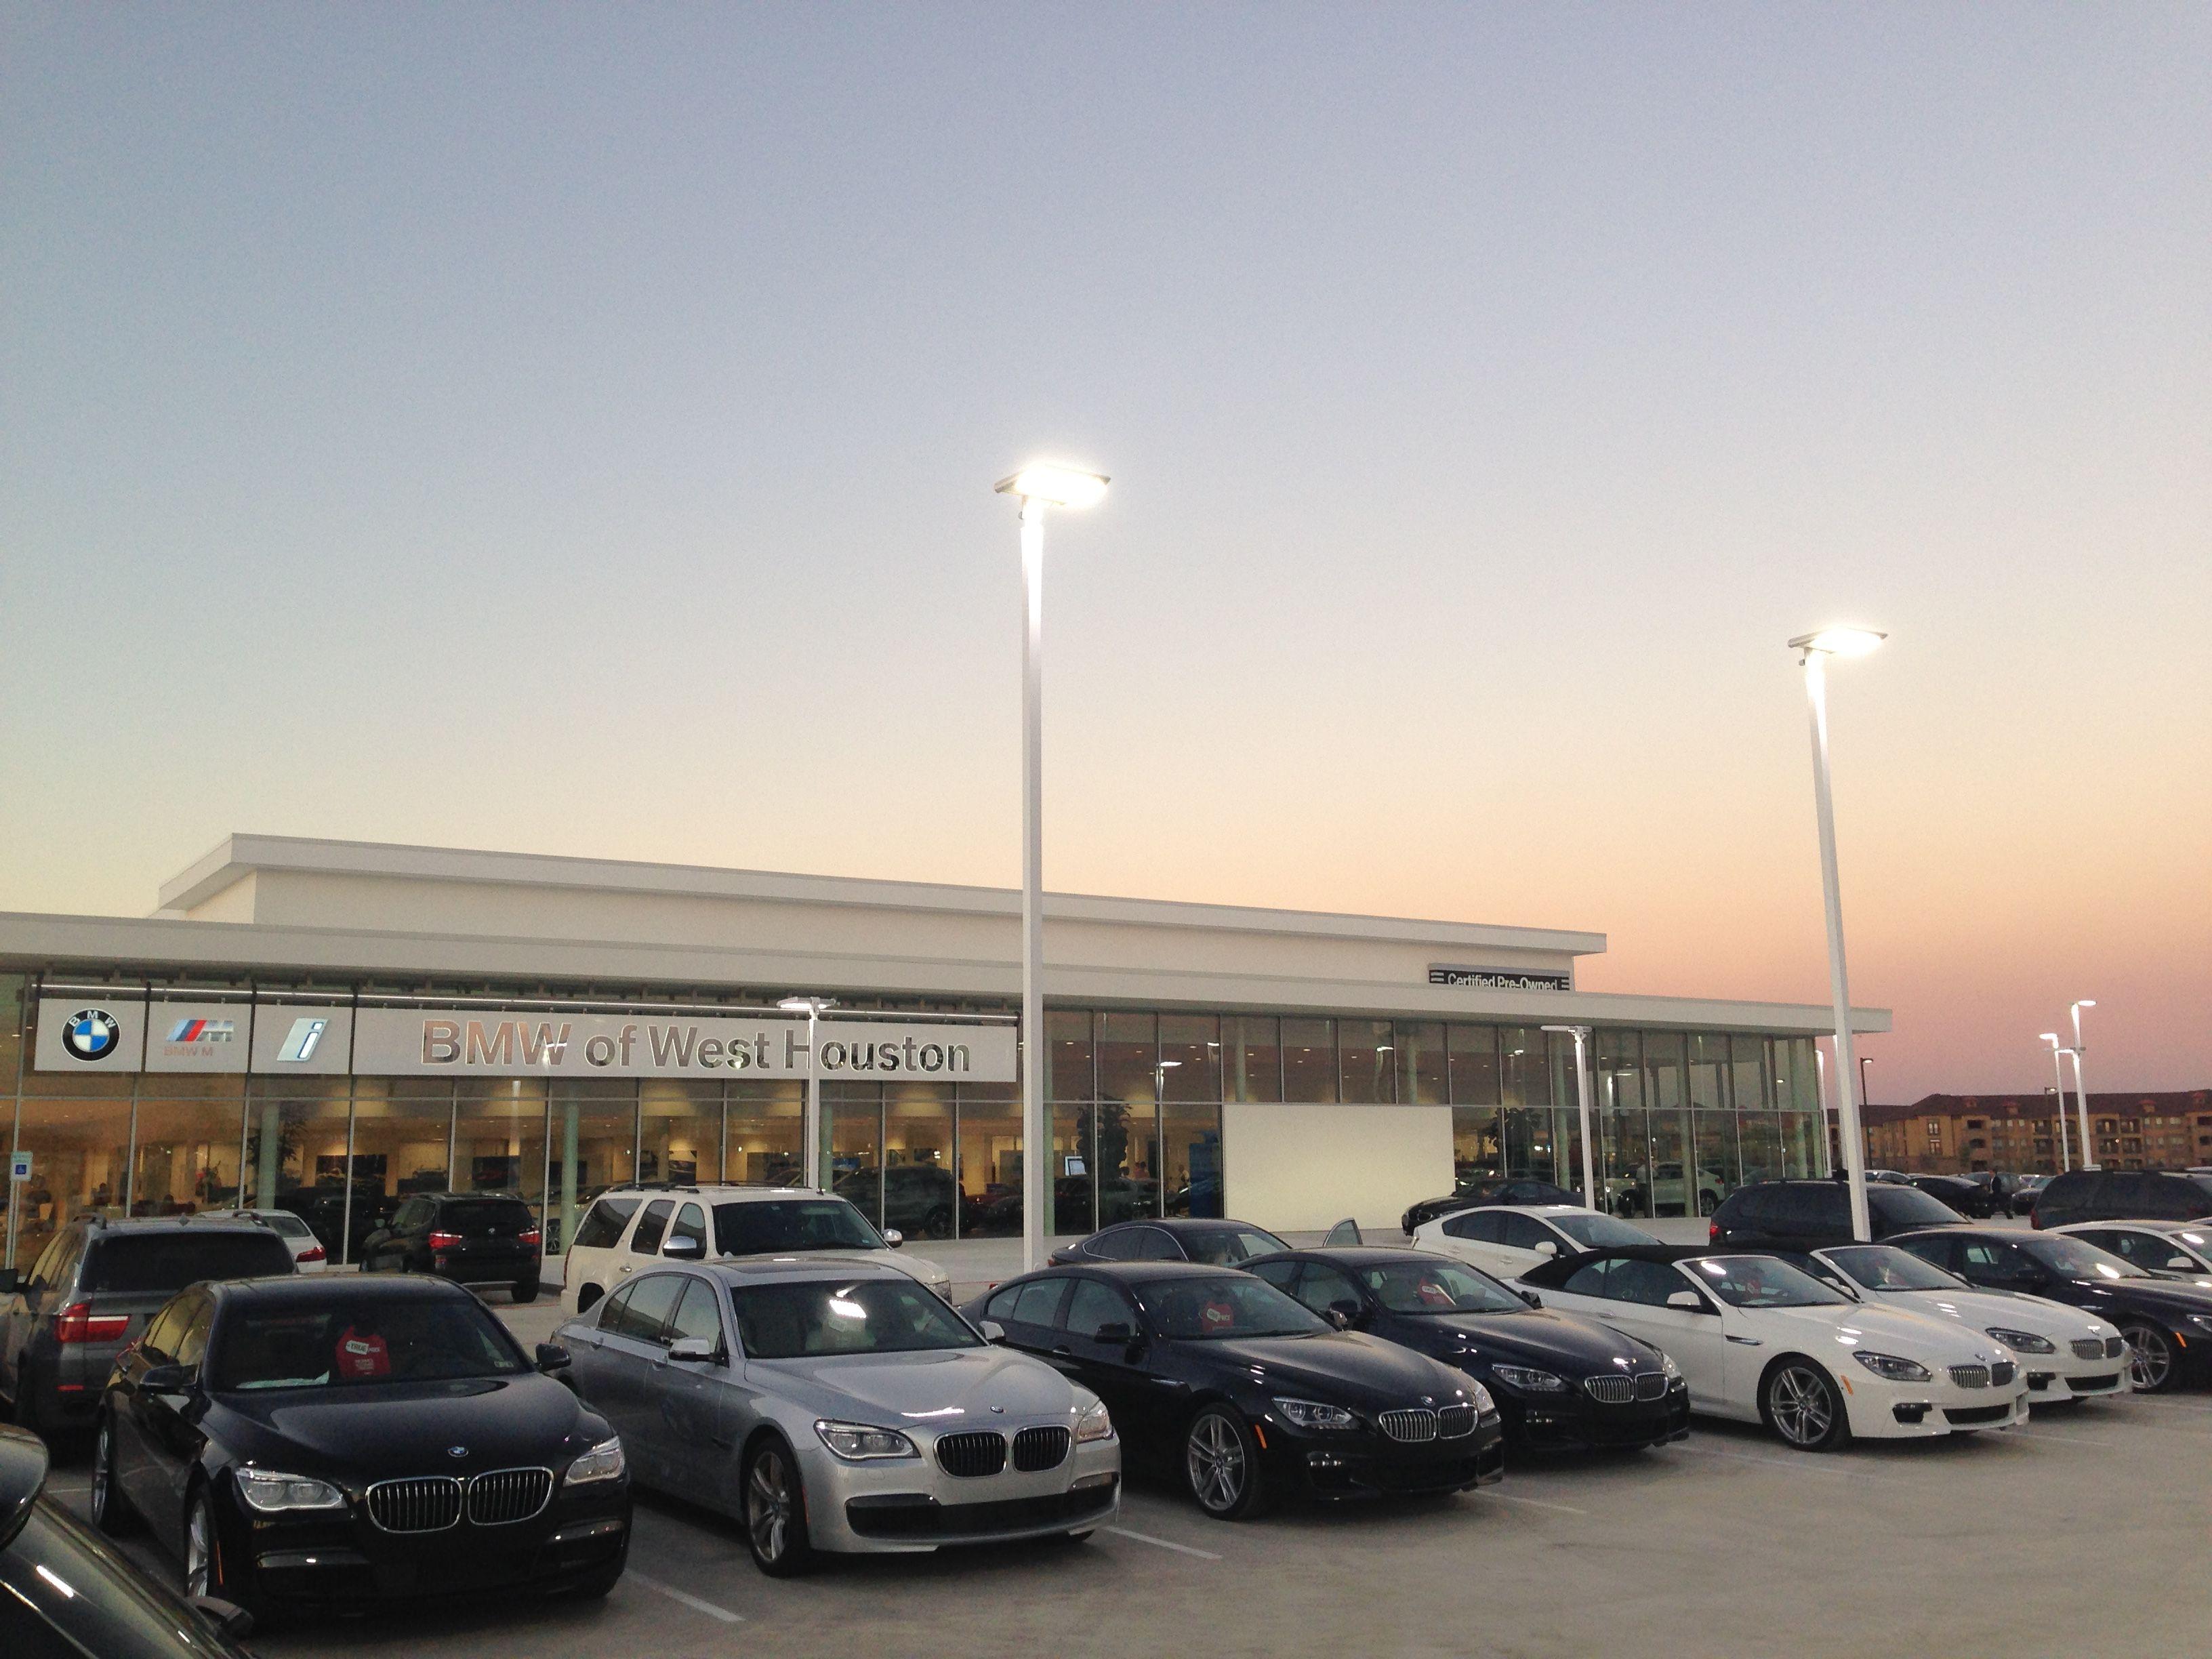 BMW of West Houston Dealership serving Katy & Sugar Land